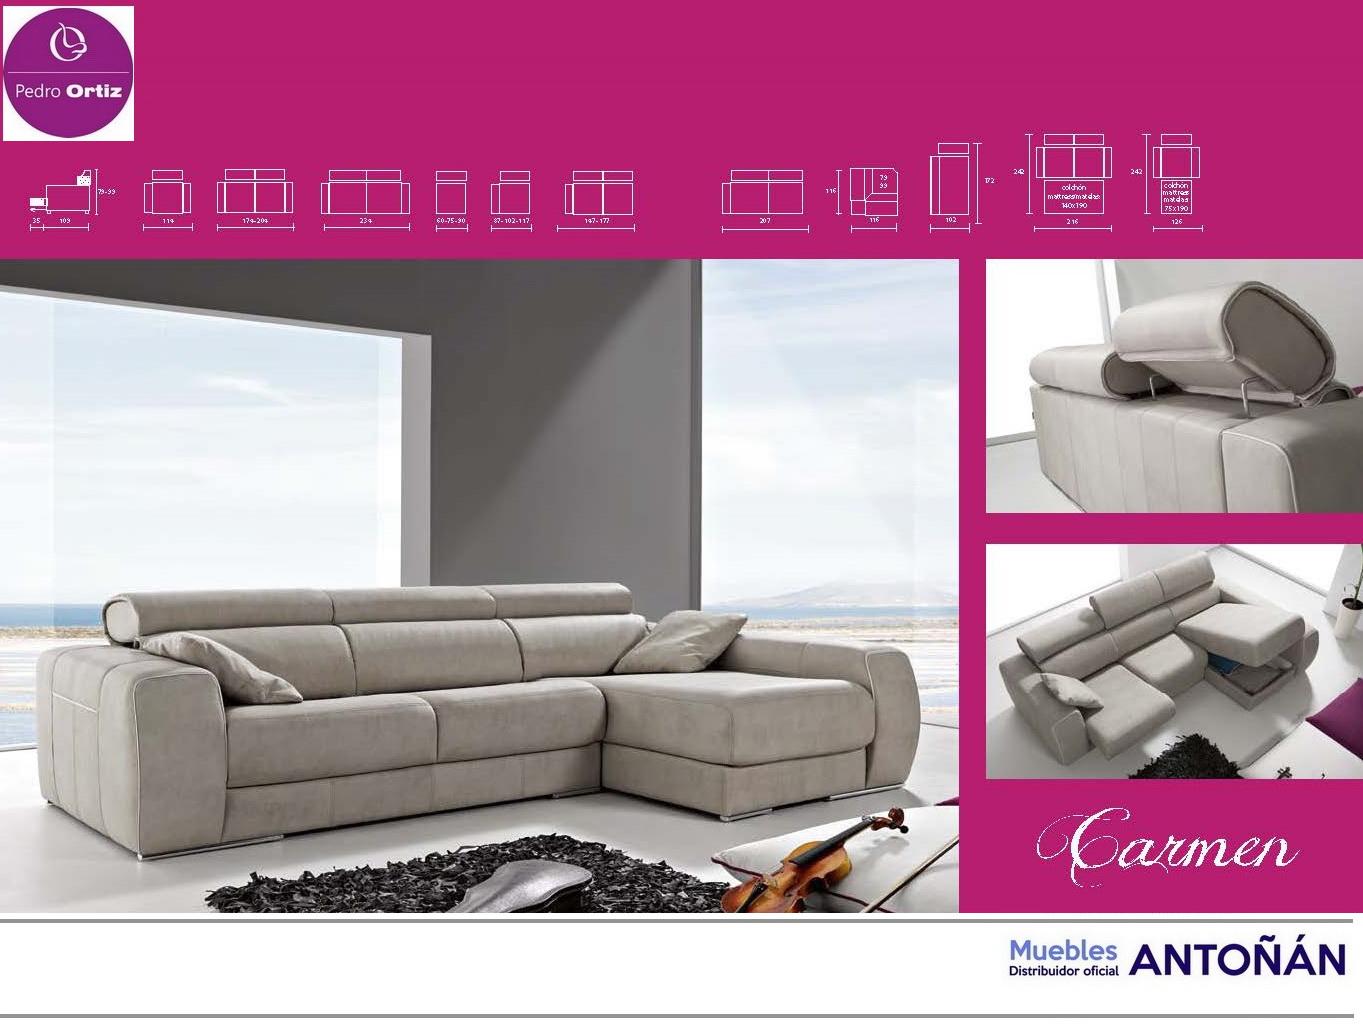 CARMEN sofá modular asientos extensibles by Pedro Ortiz 03 MEDIDAS SOFA de venta en Muebles Antoñán León